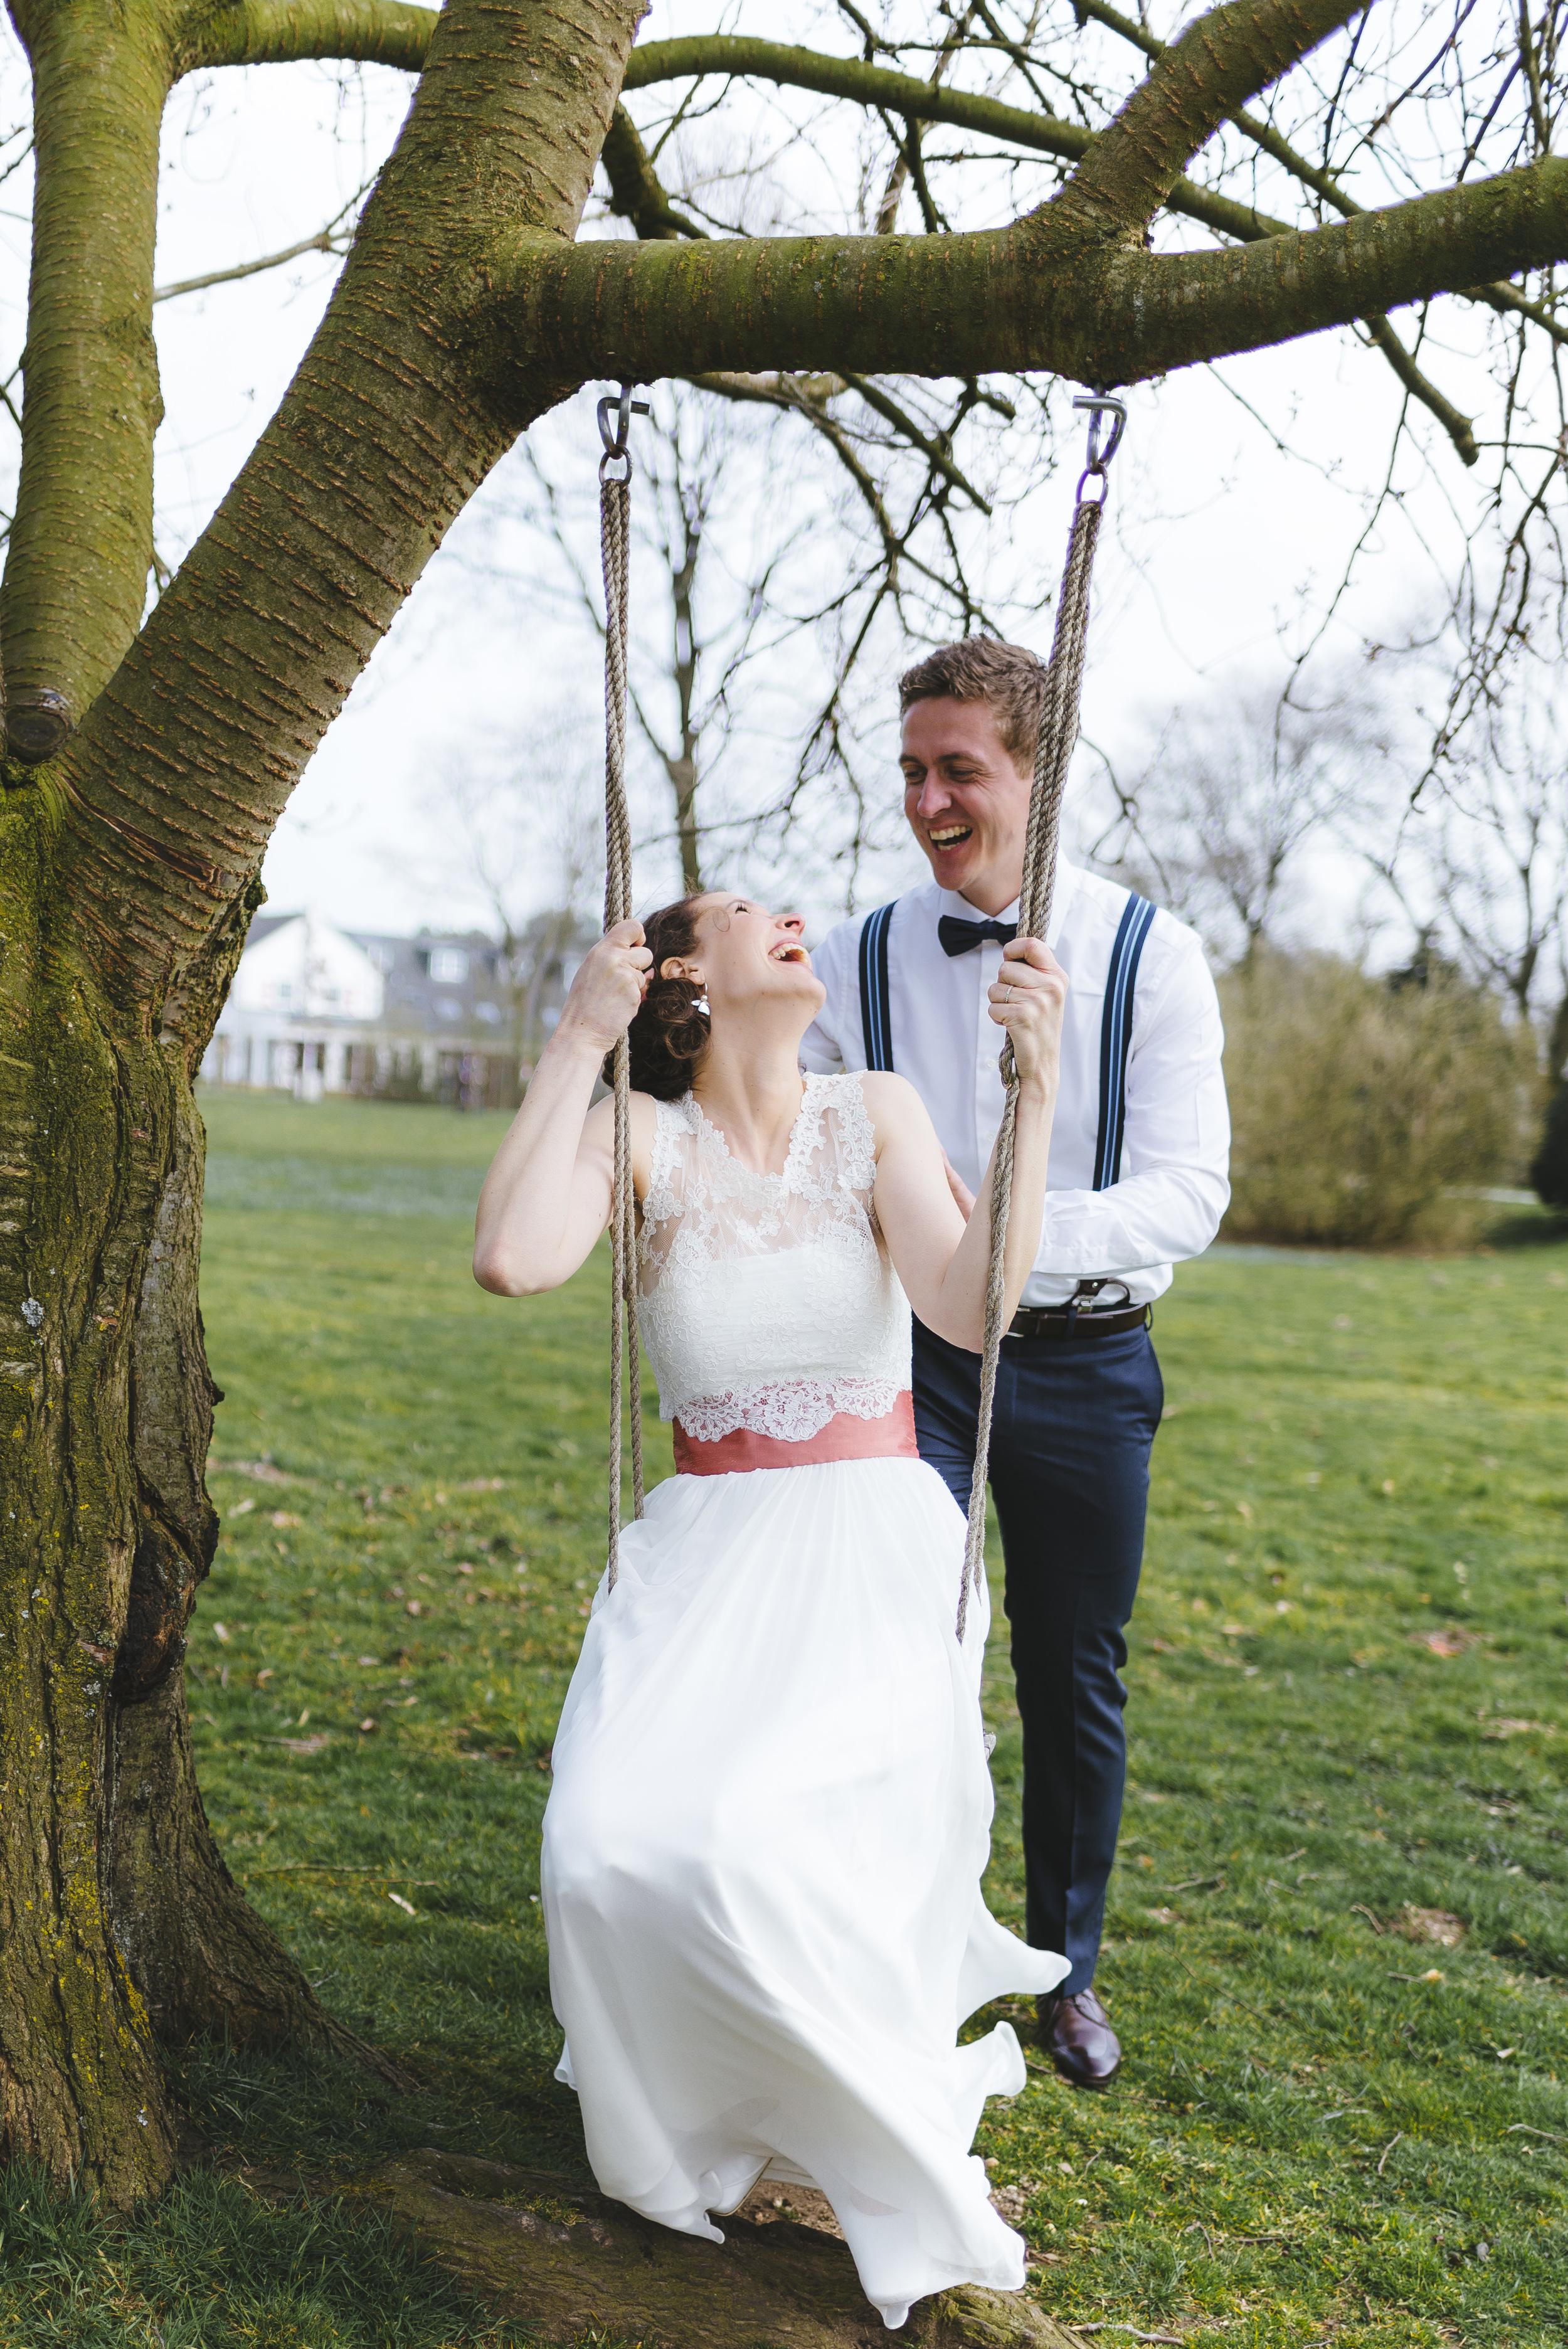 Hochzeitsfotograf-Schlossruine-Hertefeld-Weeze-036.jpg